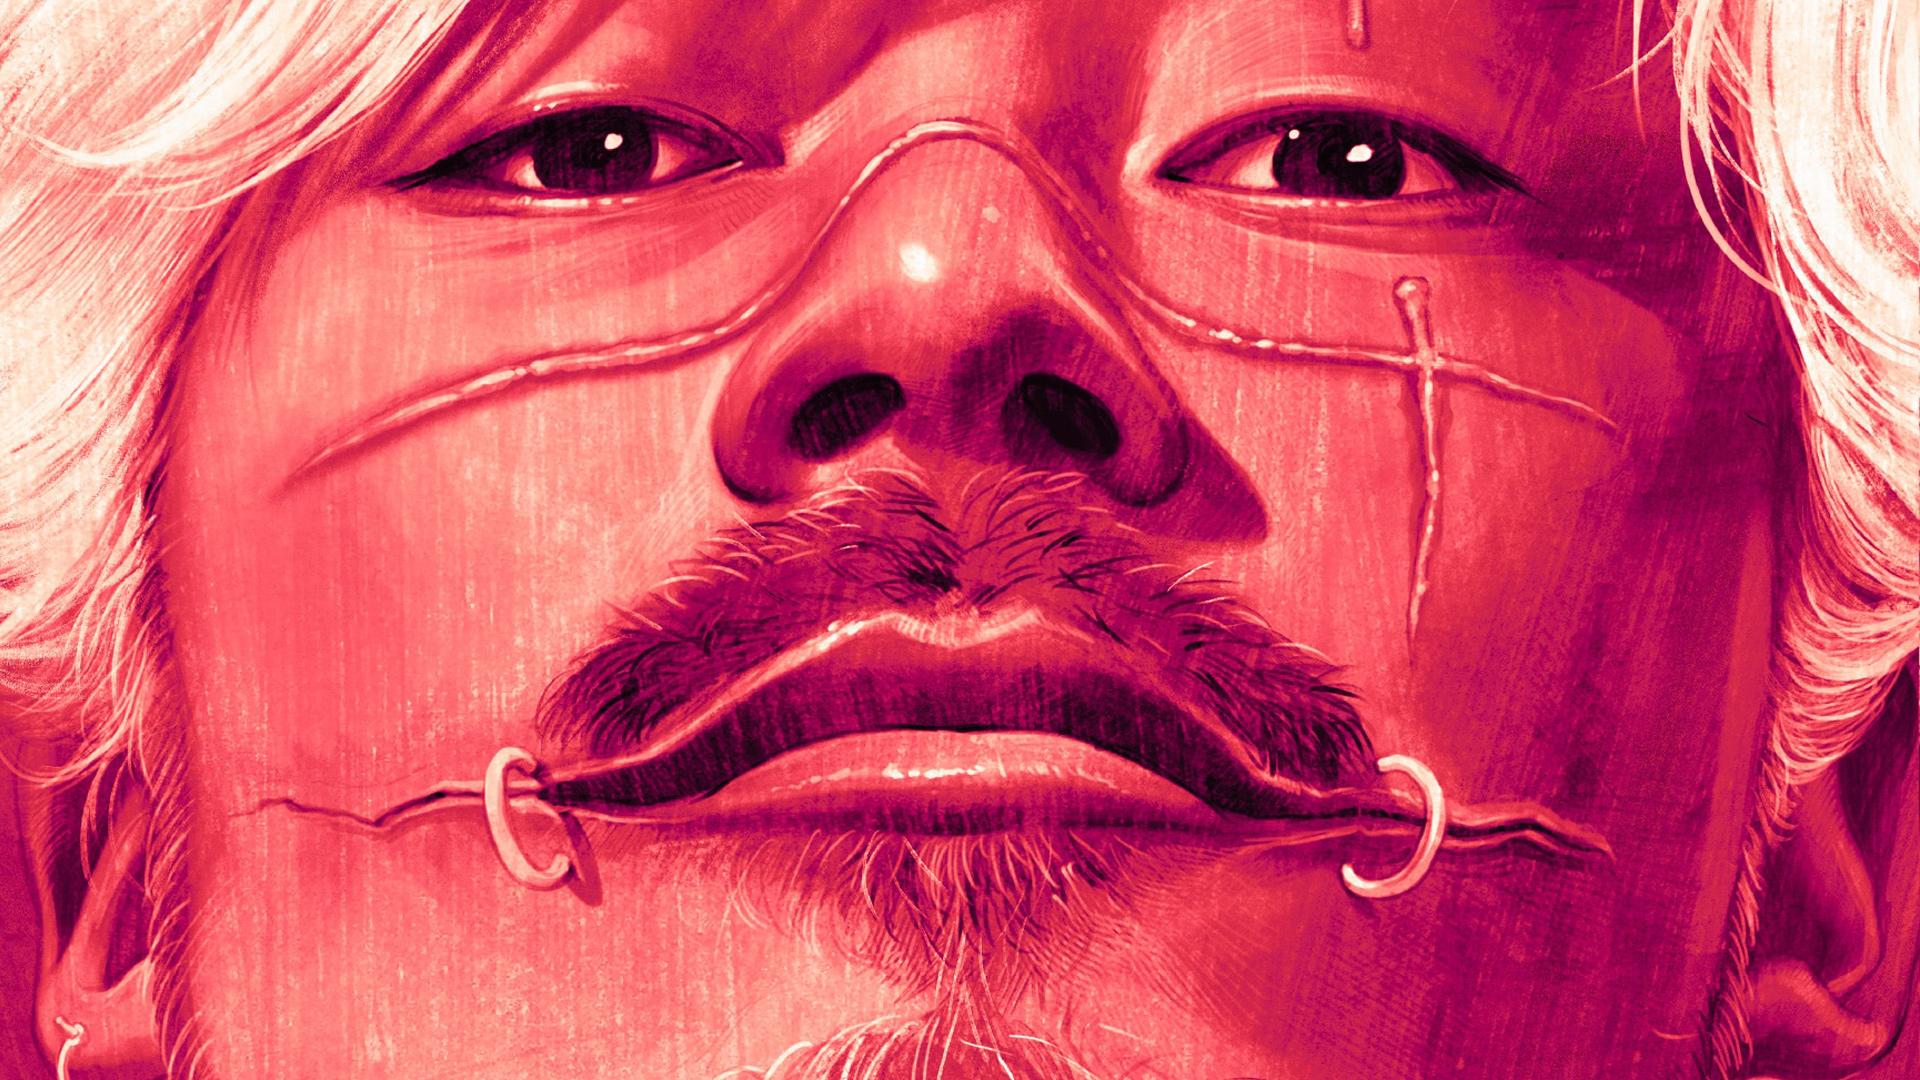 Ichi the Killer: Definitive Remastered Edition